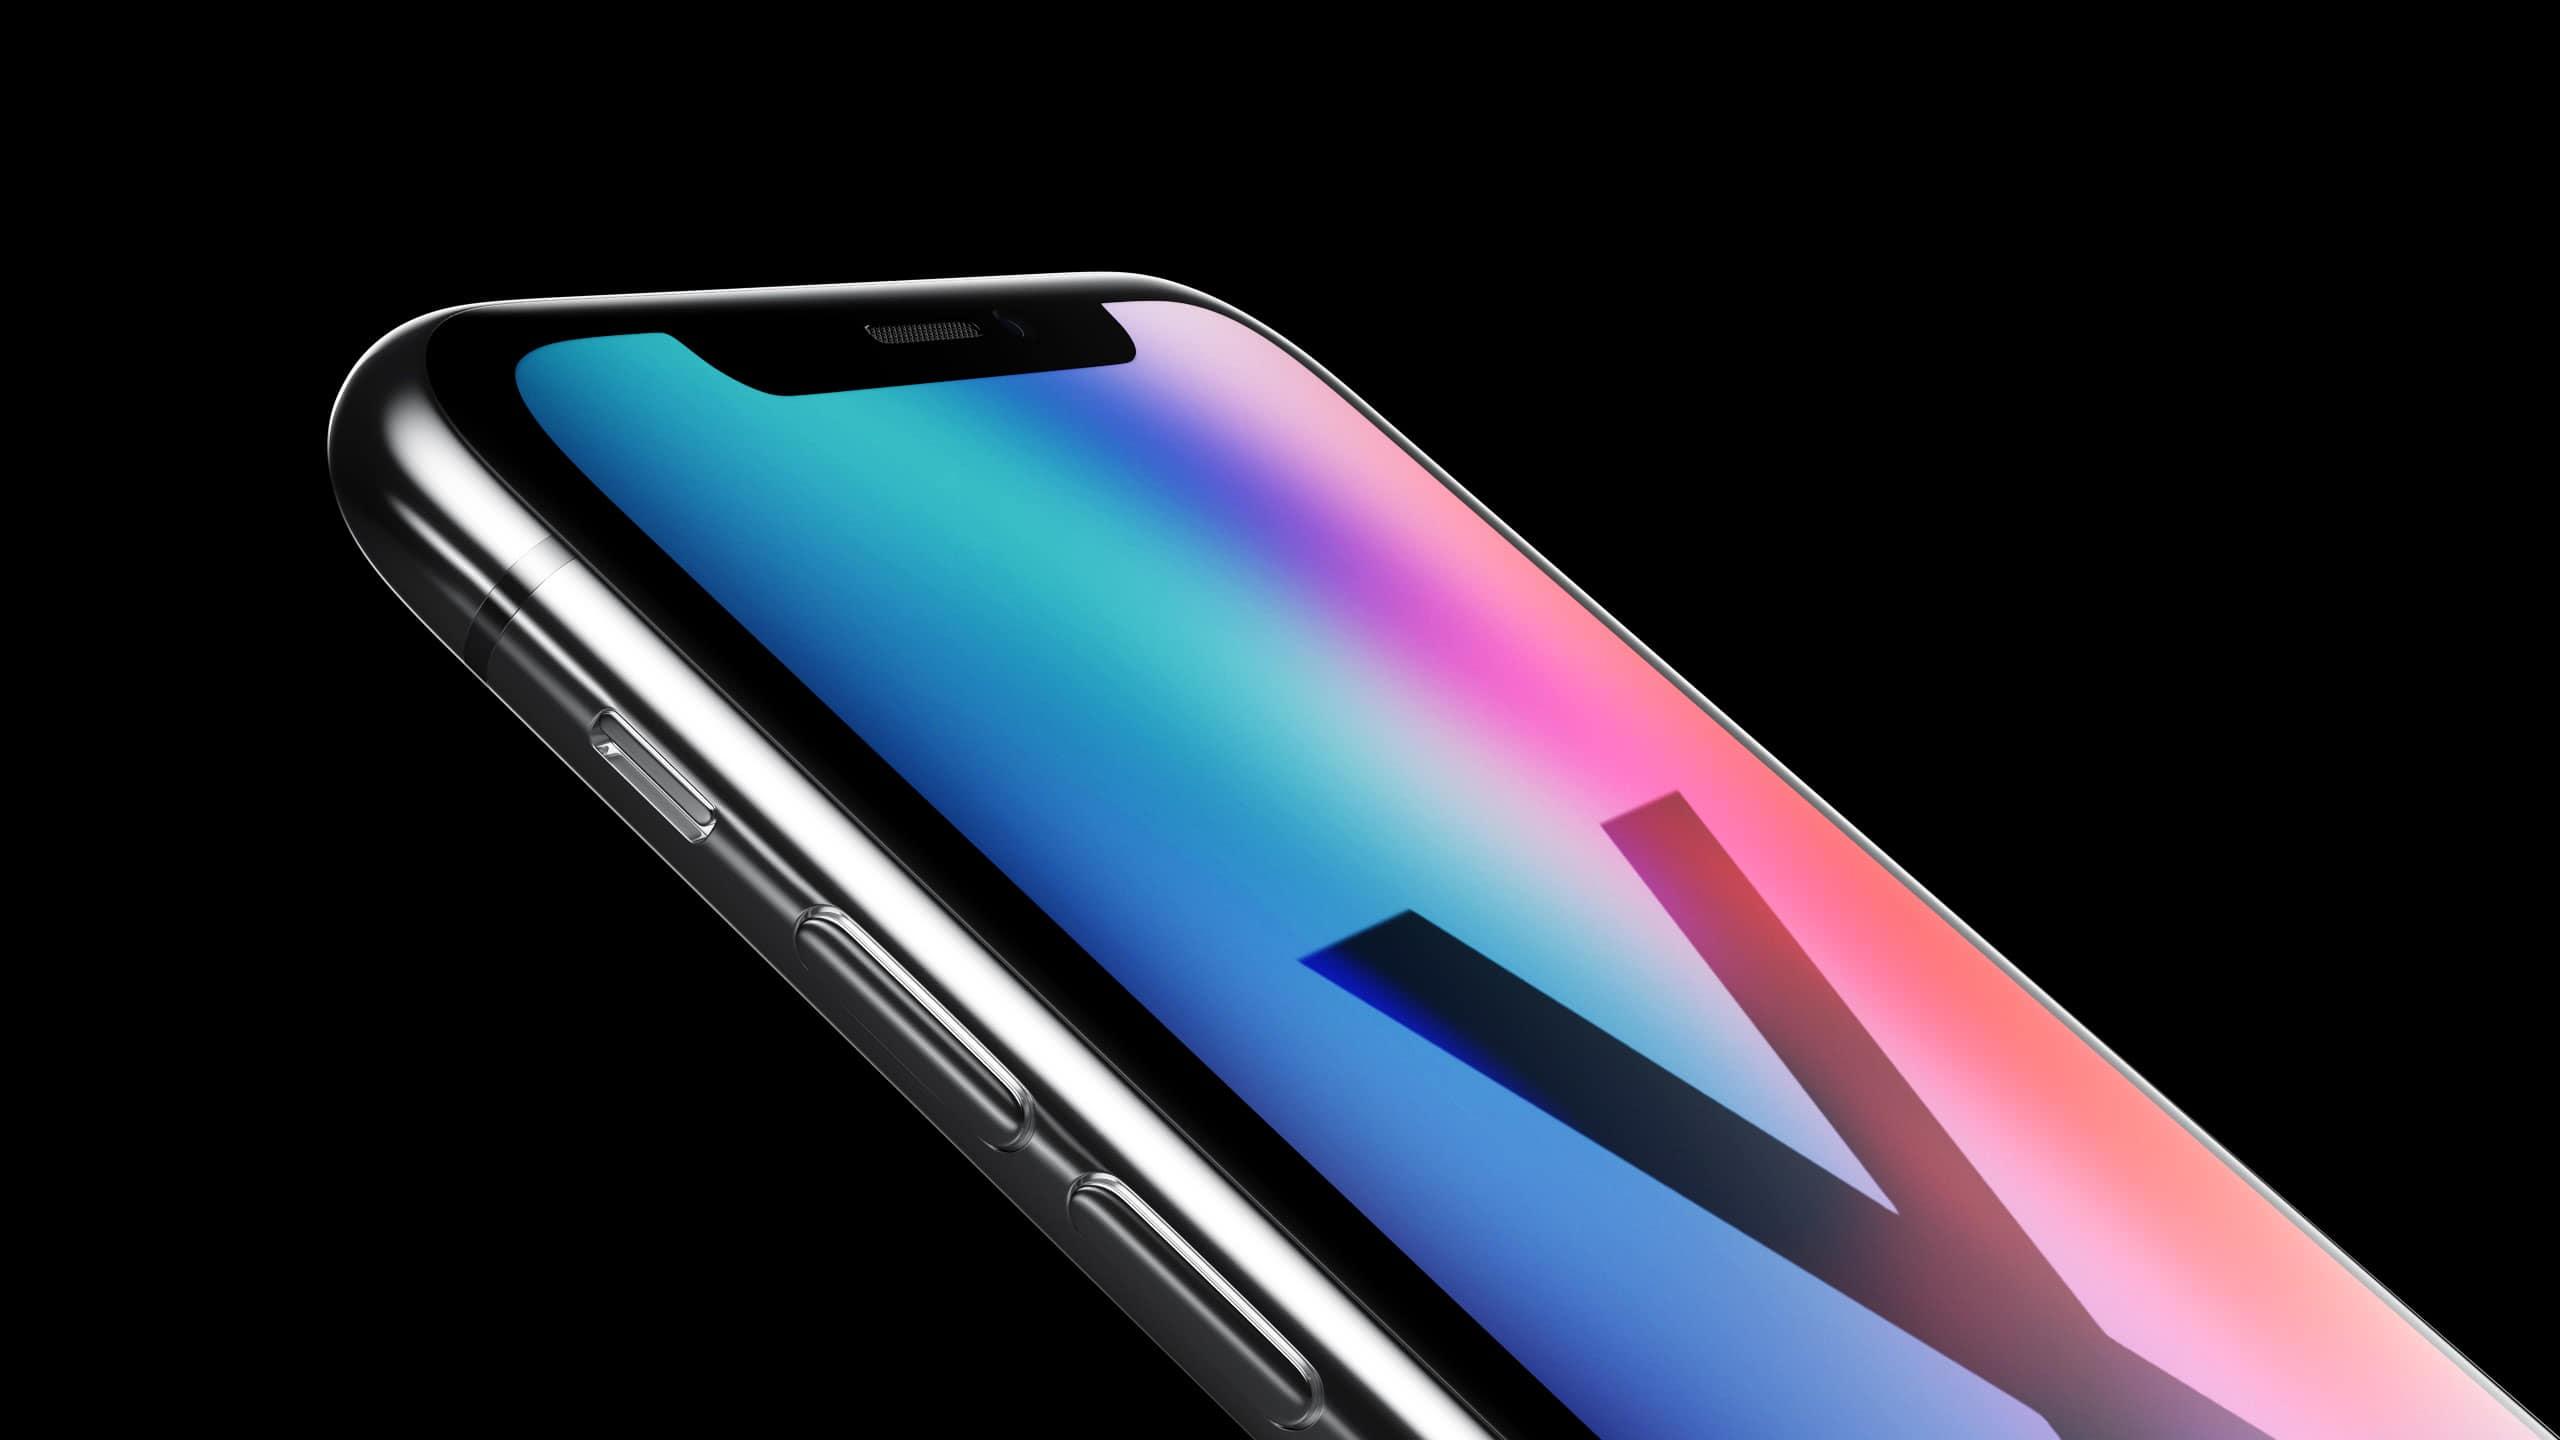 apple iphone x wqhd 1440p wallpaper